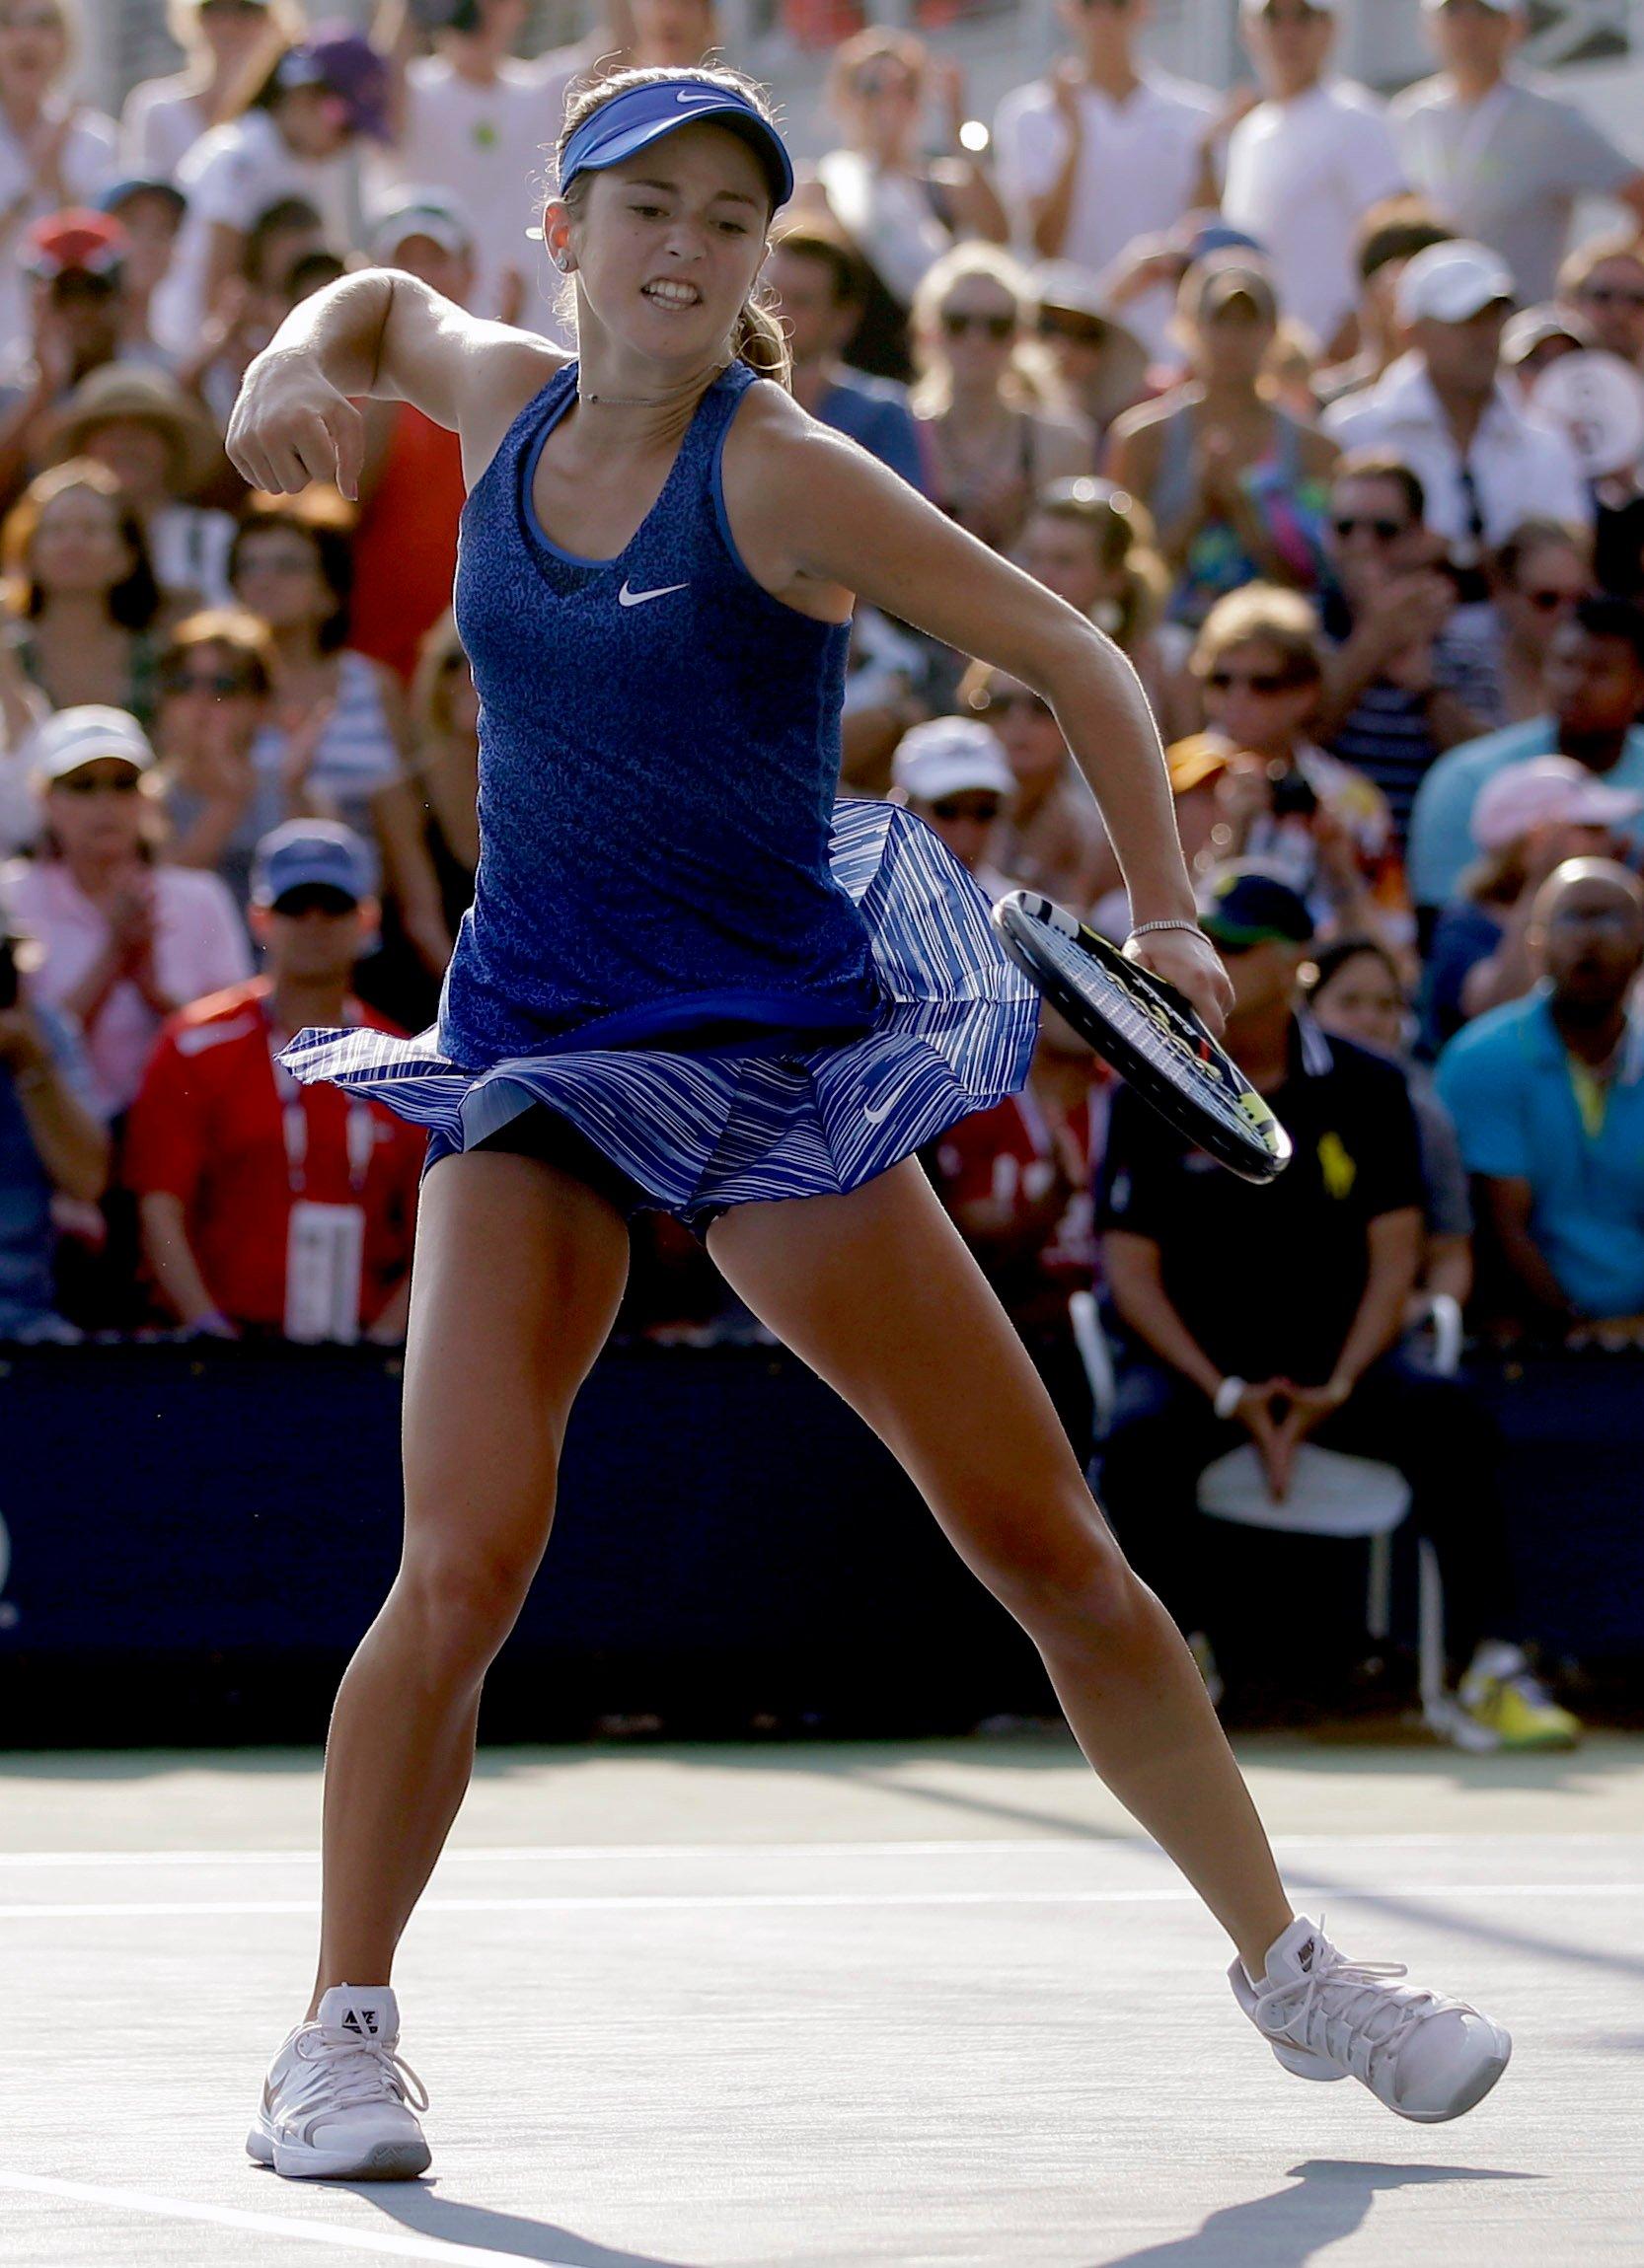 aptopix_2014_us_open_tennis273558178891_r4942.jpg